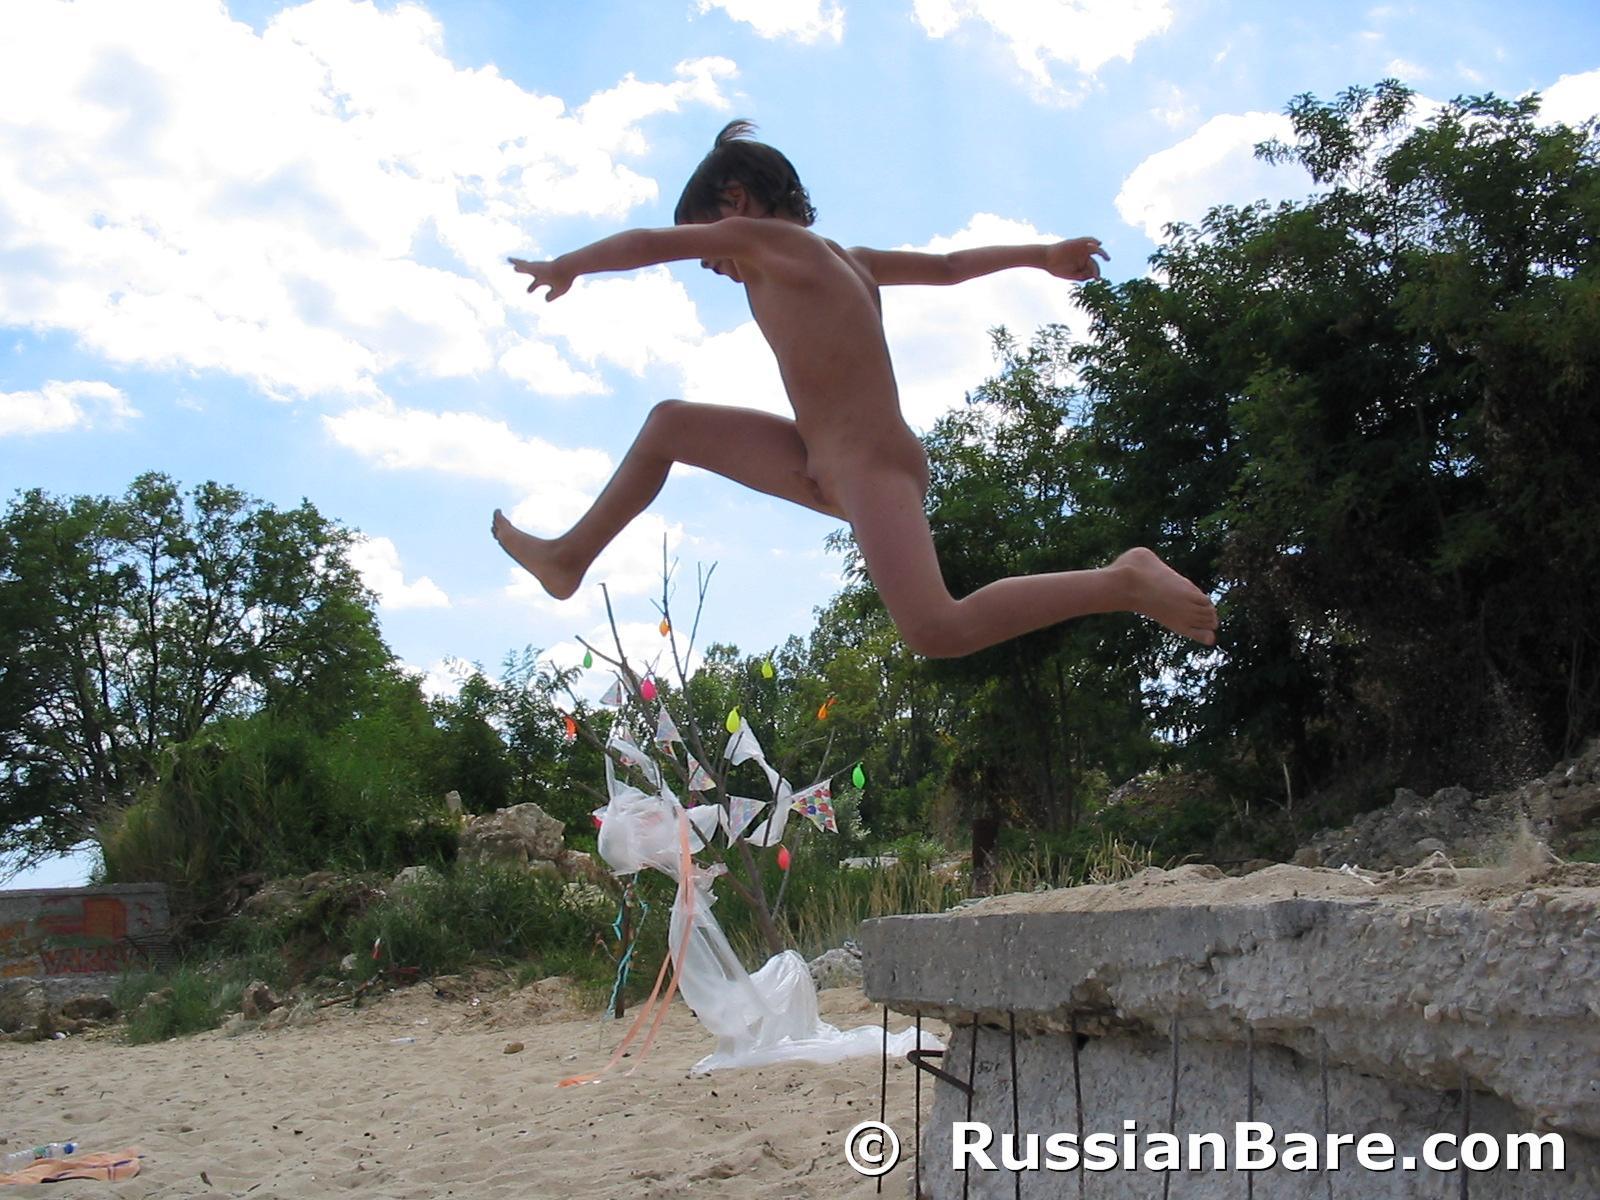 Bulgarian nudist festival